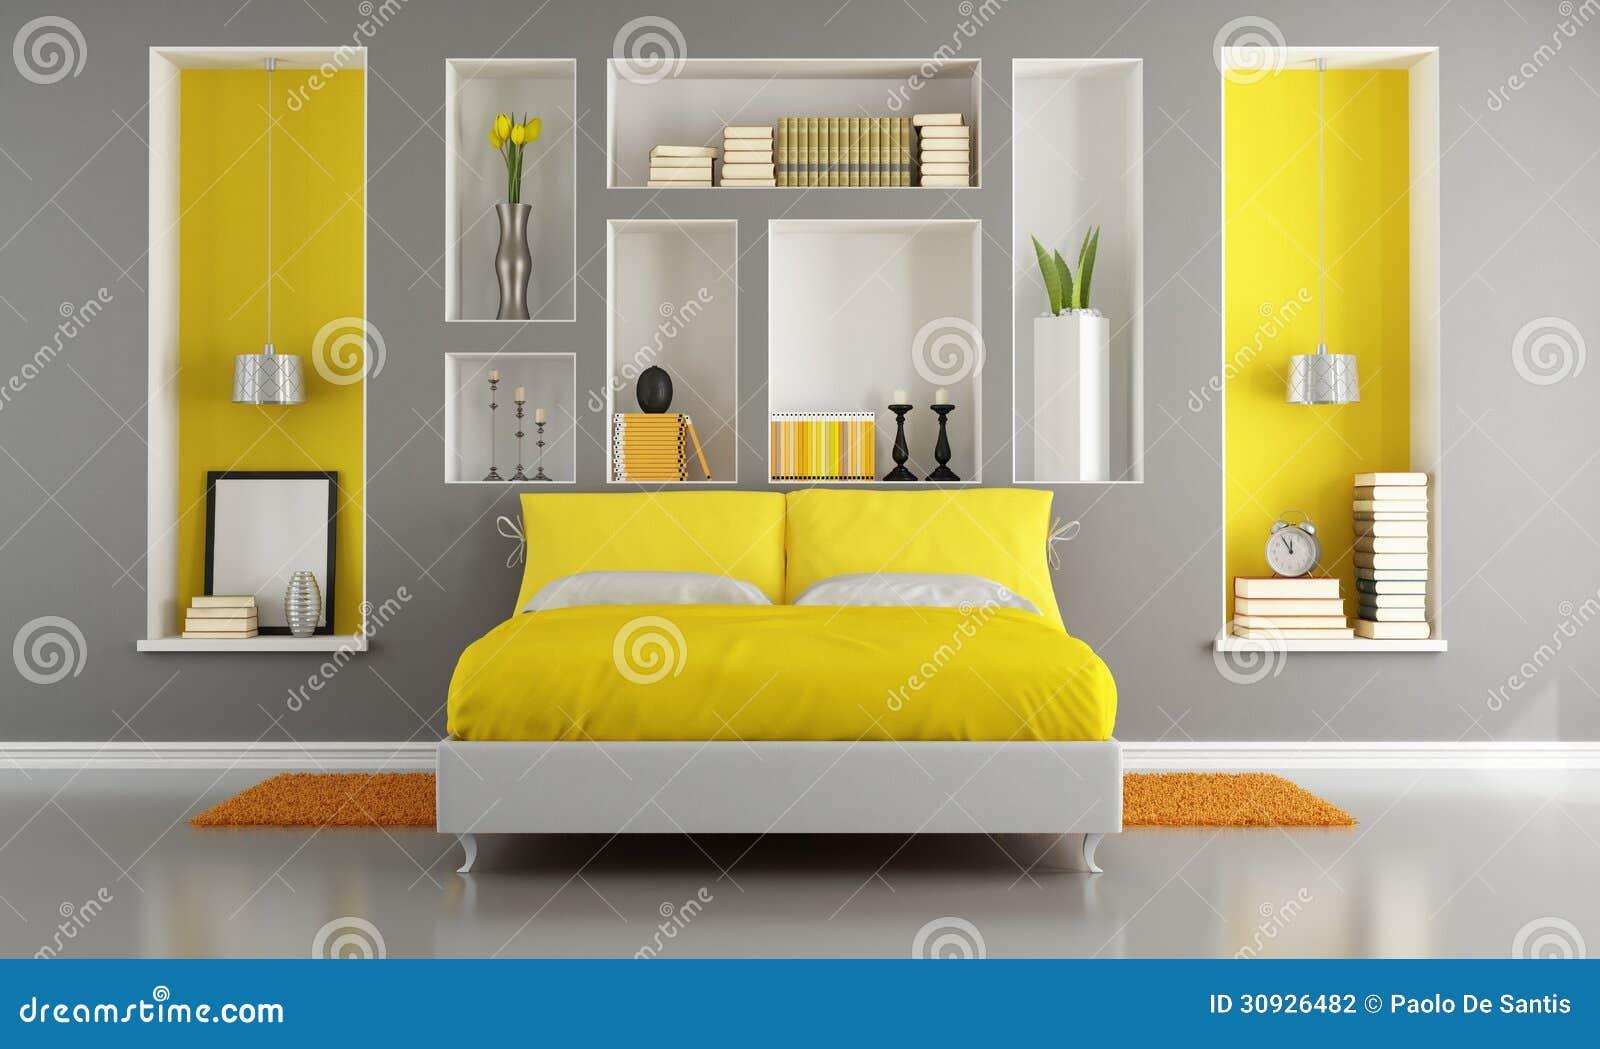 chambre coucher moderne jaune et grise photographie. Black Bedroom Furniture Sets. Home Design Ideas